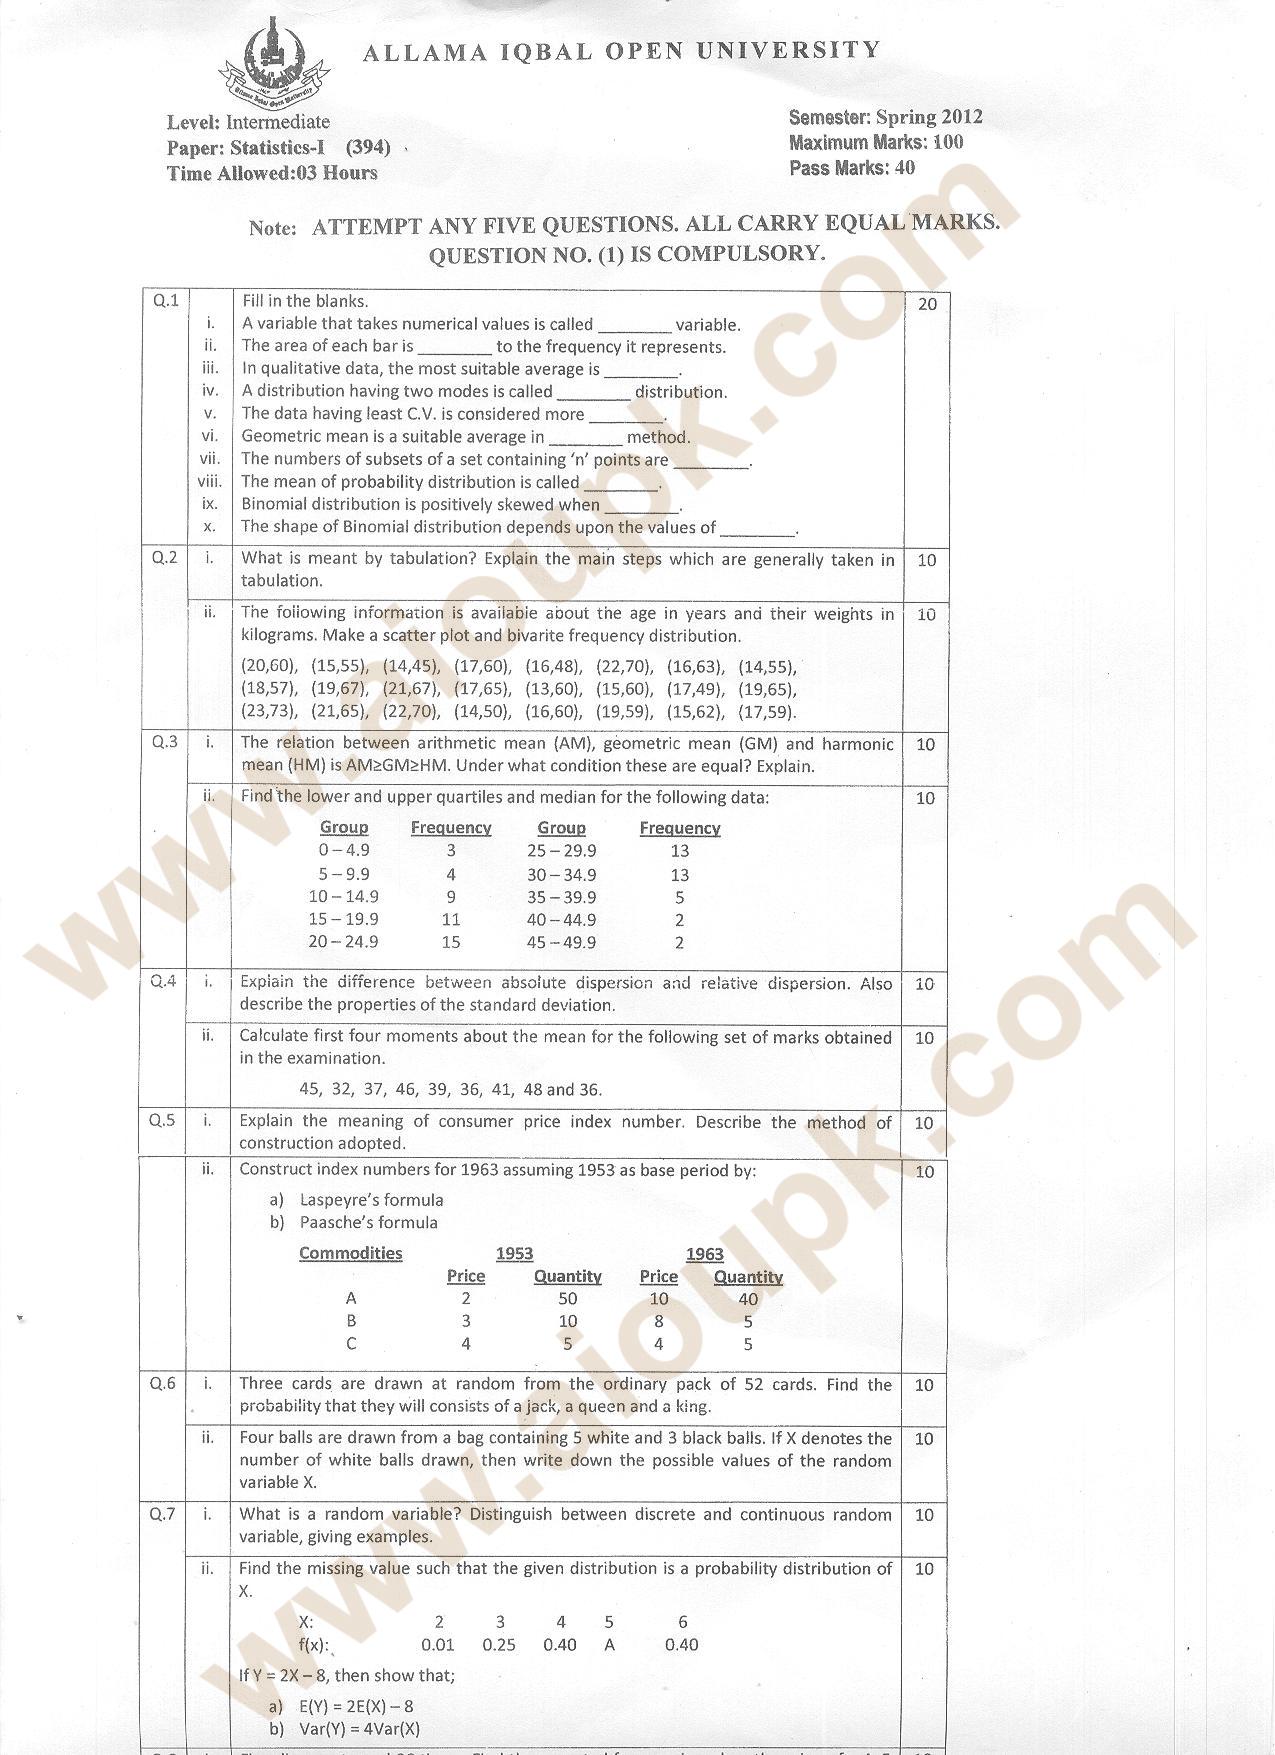 Statistics-I Code 394 Level Intermediate (I.Com / F.Sc